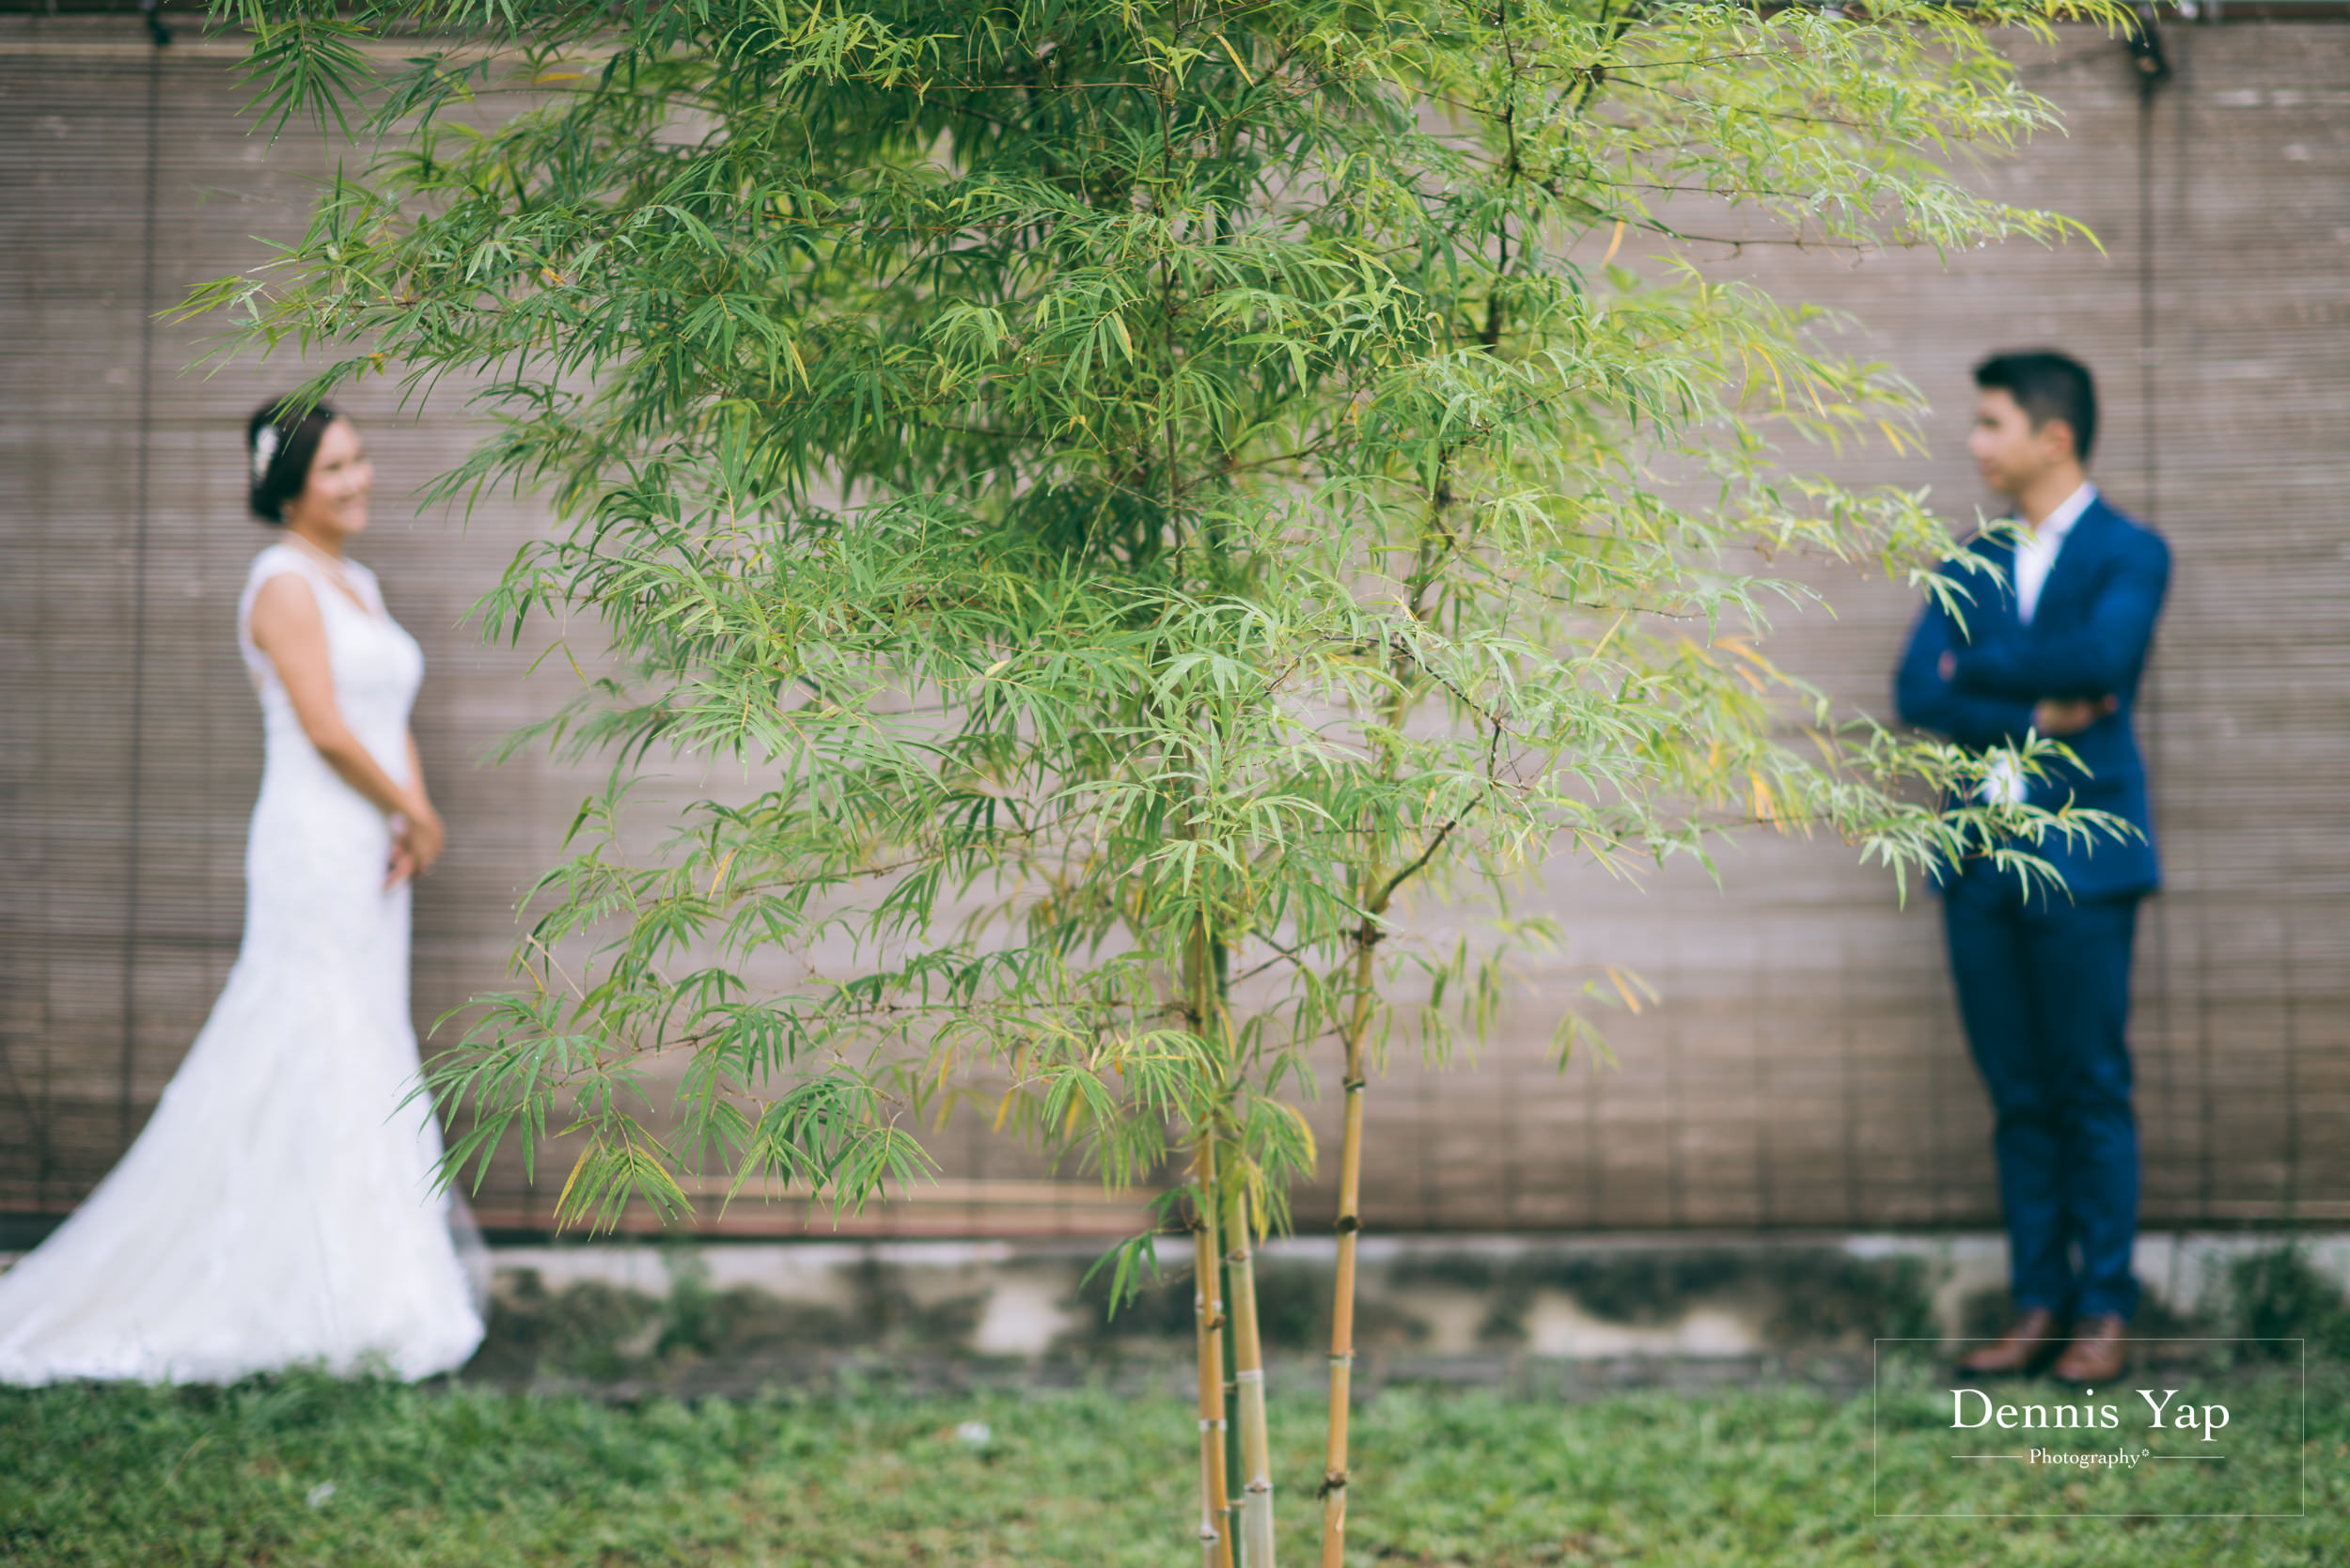 jung munn yein prewedding baby family dennis yap photography janda baik-12.jpg